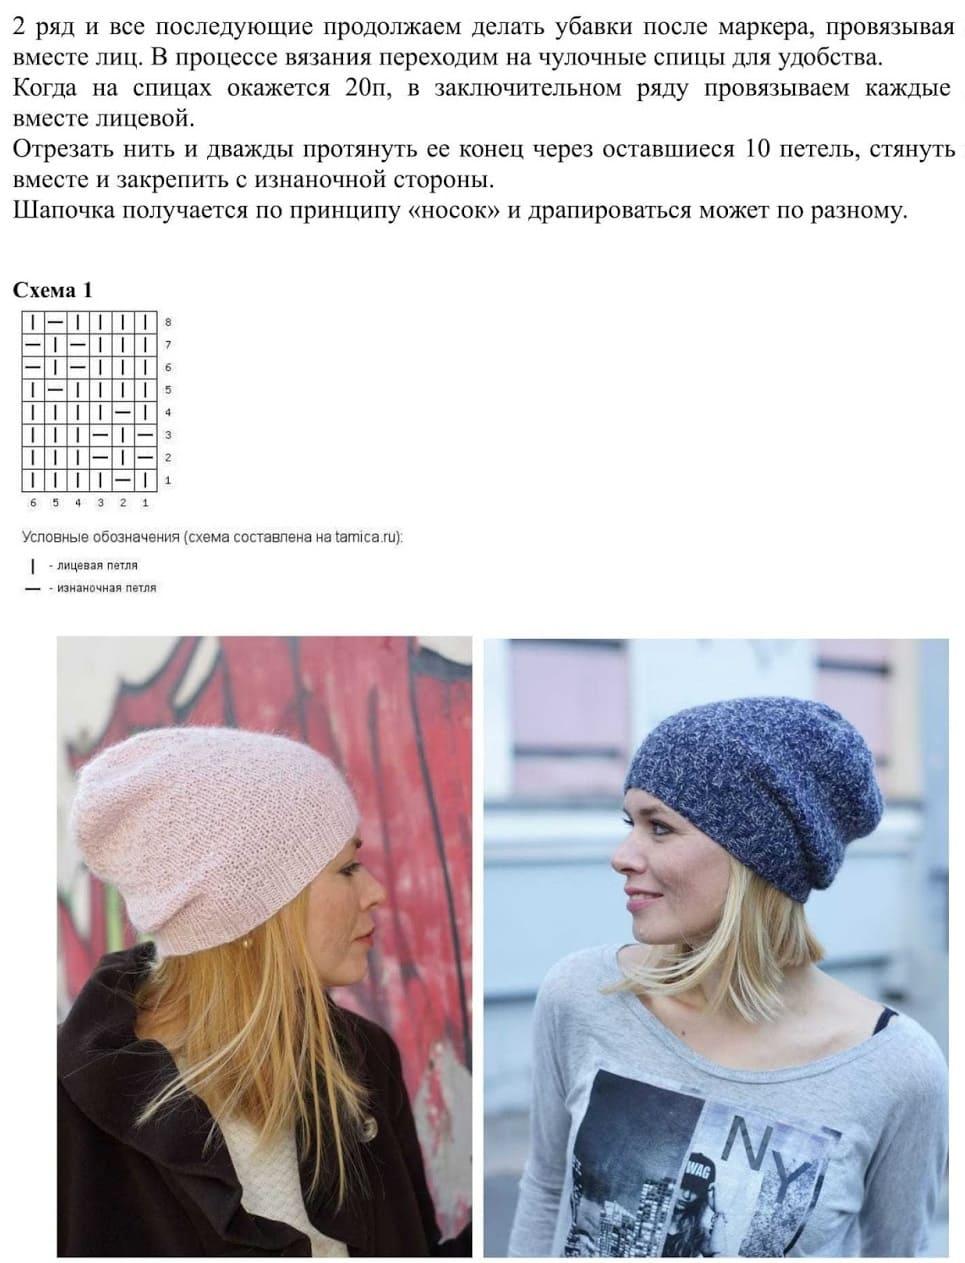 Вязаные шапки спицами 2018: новинки, фото пошагово